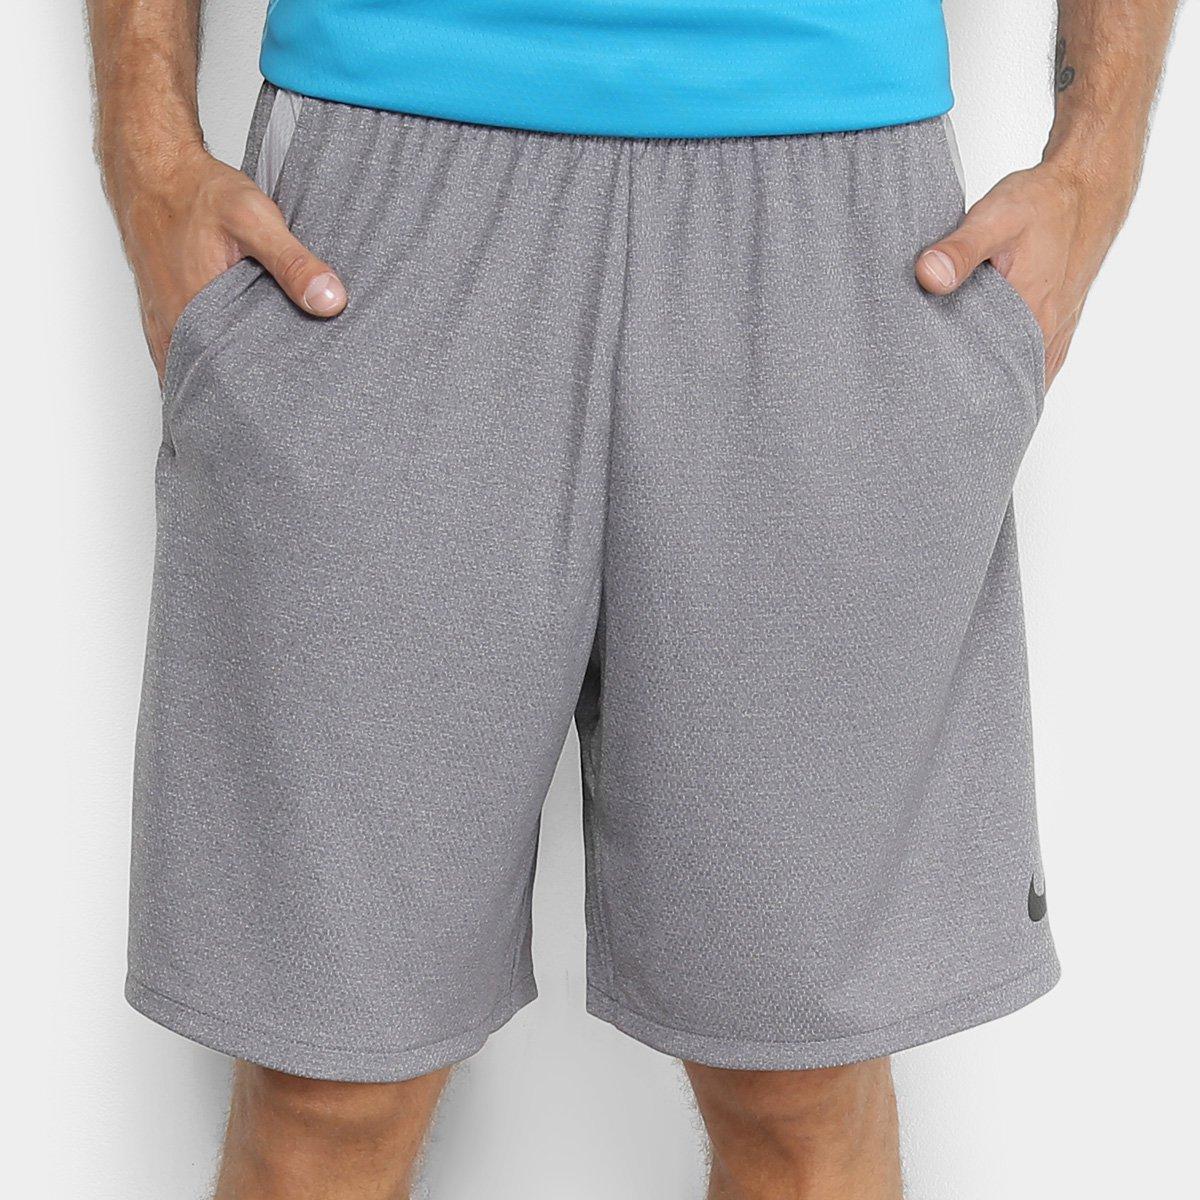 a58d708f24 Bermuda Nike Dry 4.0 Masculina - Grafite e Preto - Compre Agora ...